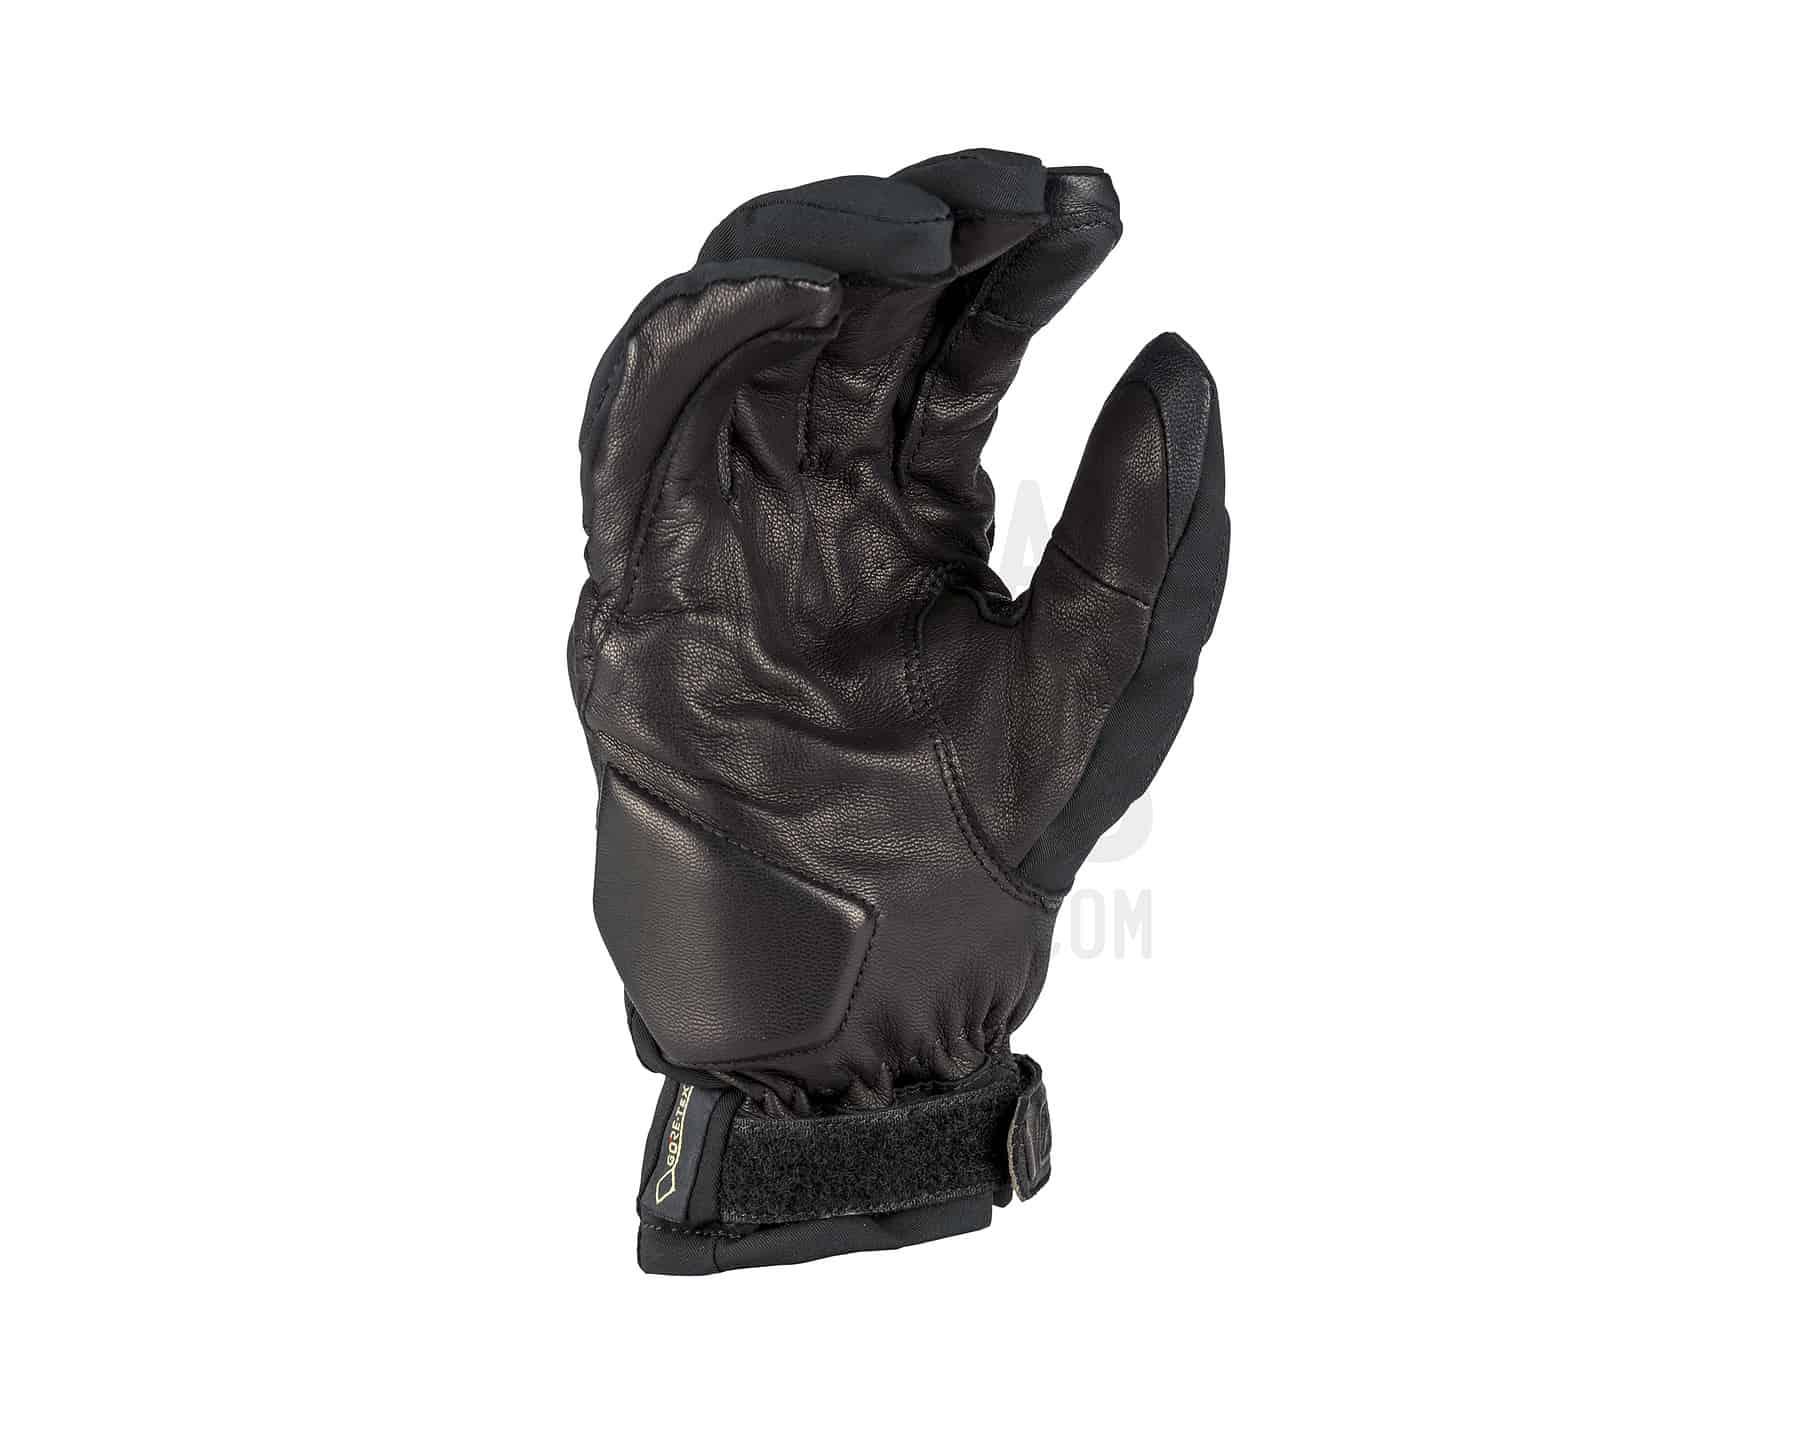 Vanguard GTX Short Glove_3922-000_Black_02